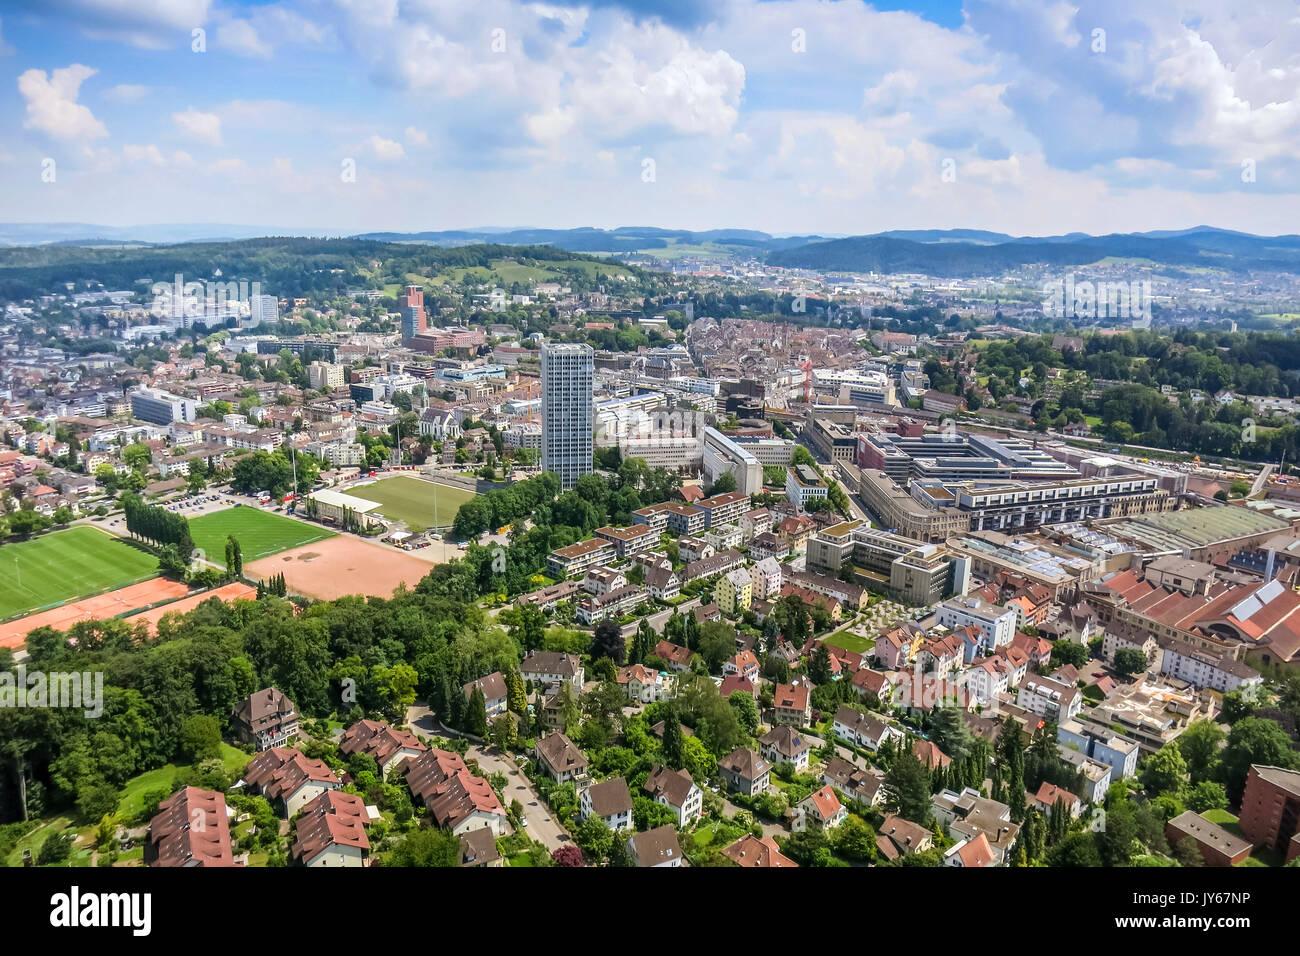 Luftaufnahme Stadt Winterthur *** Local Caption ...